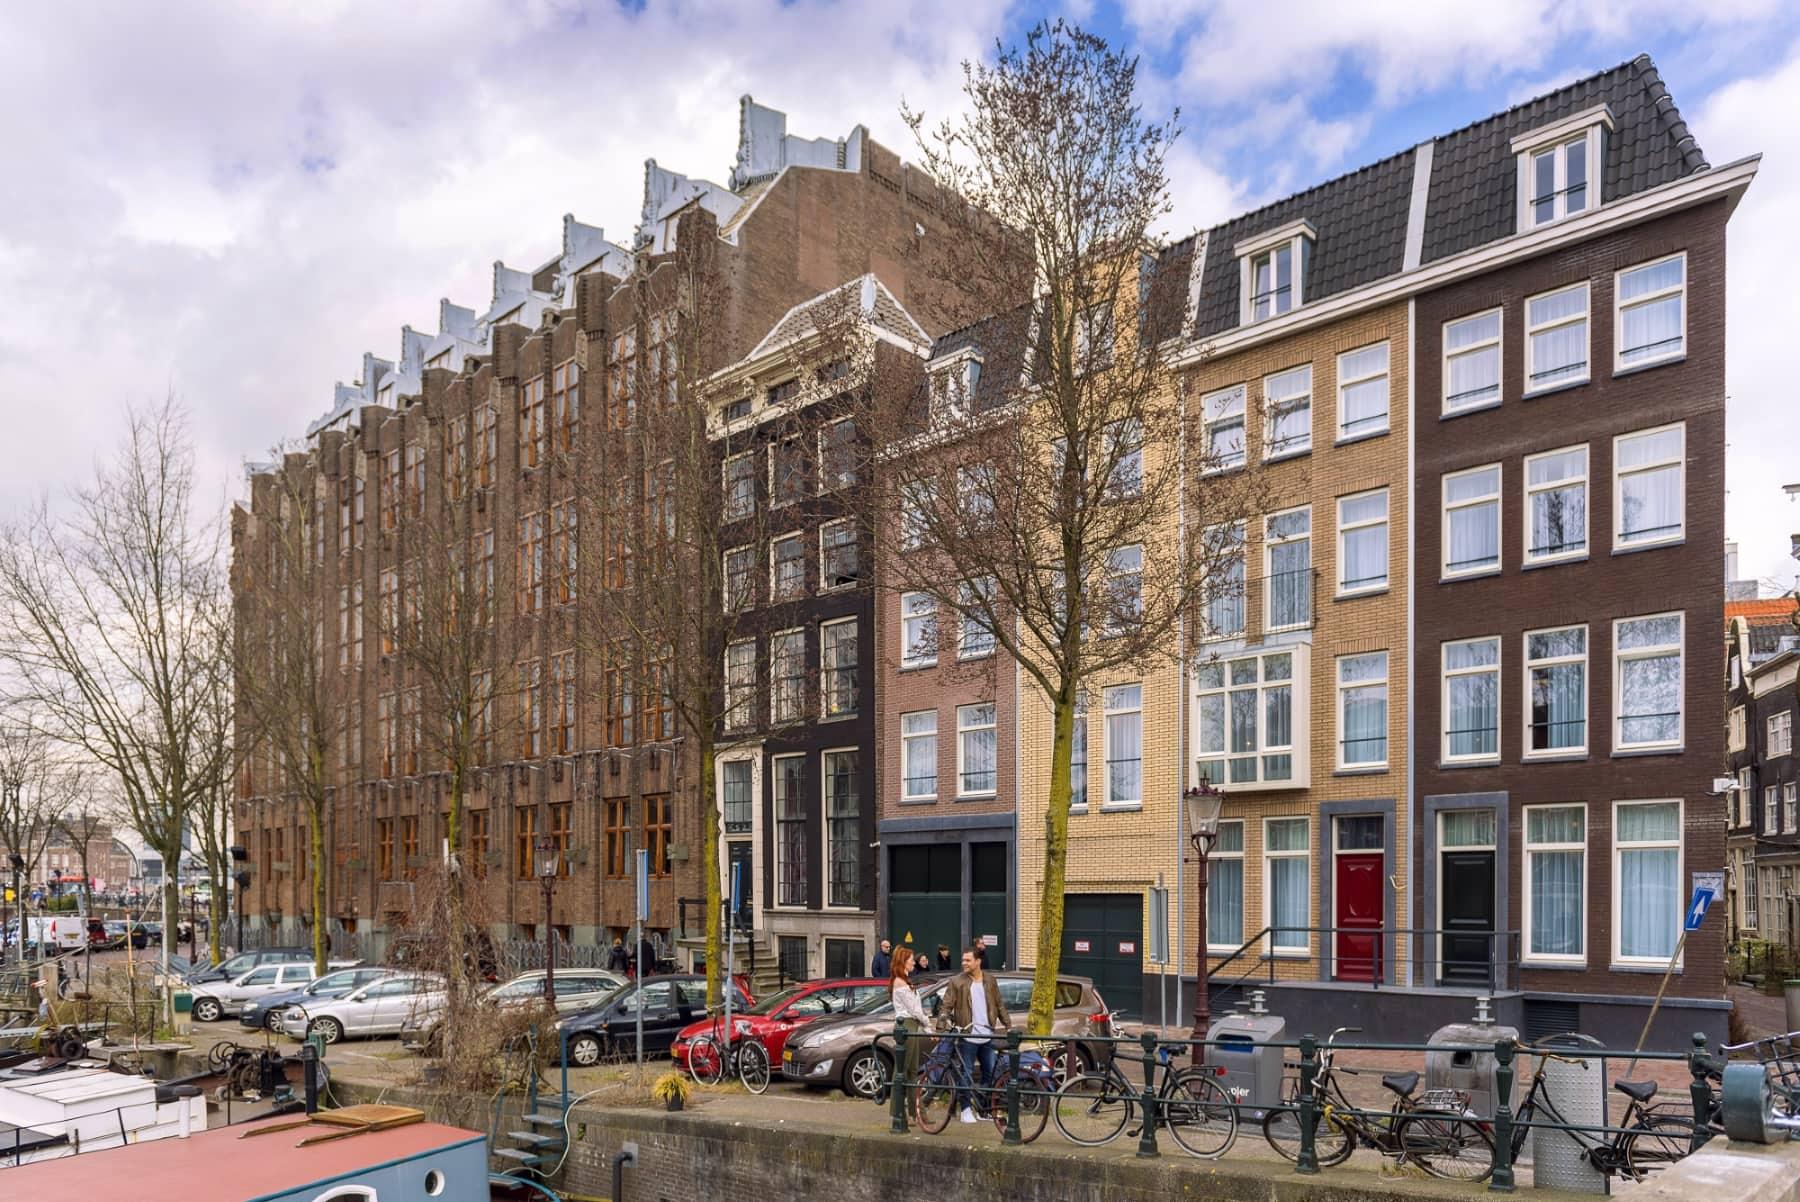 Grand Hotel Amrath Amsterdam Extension Pellikaan